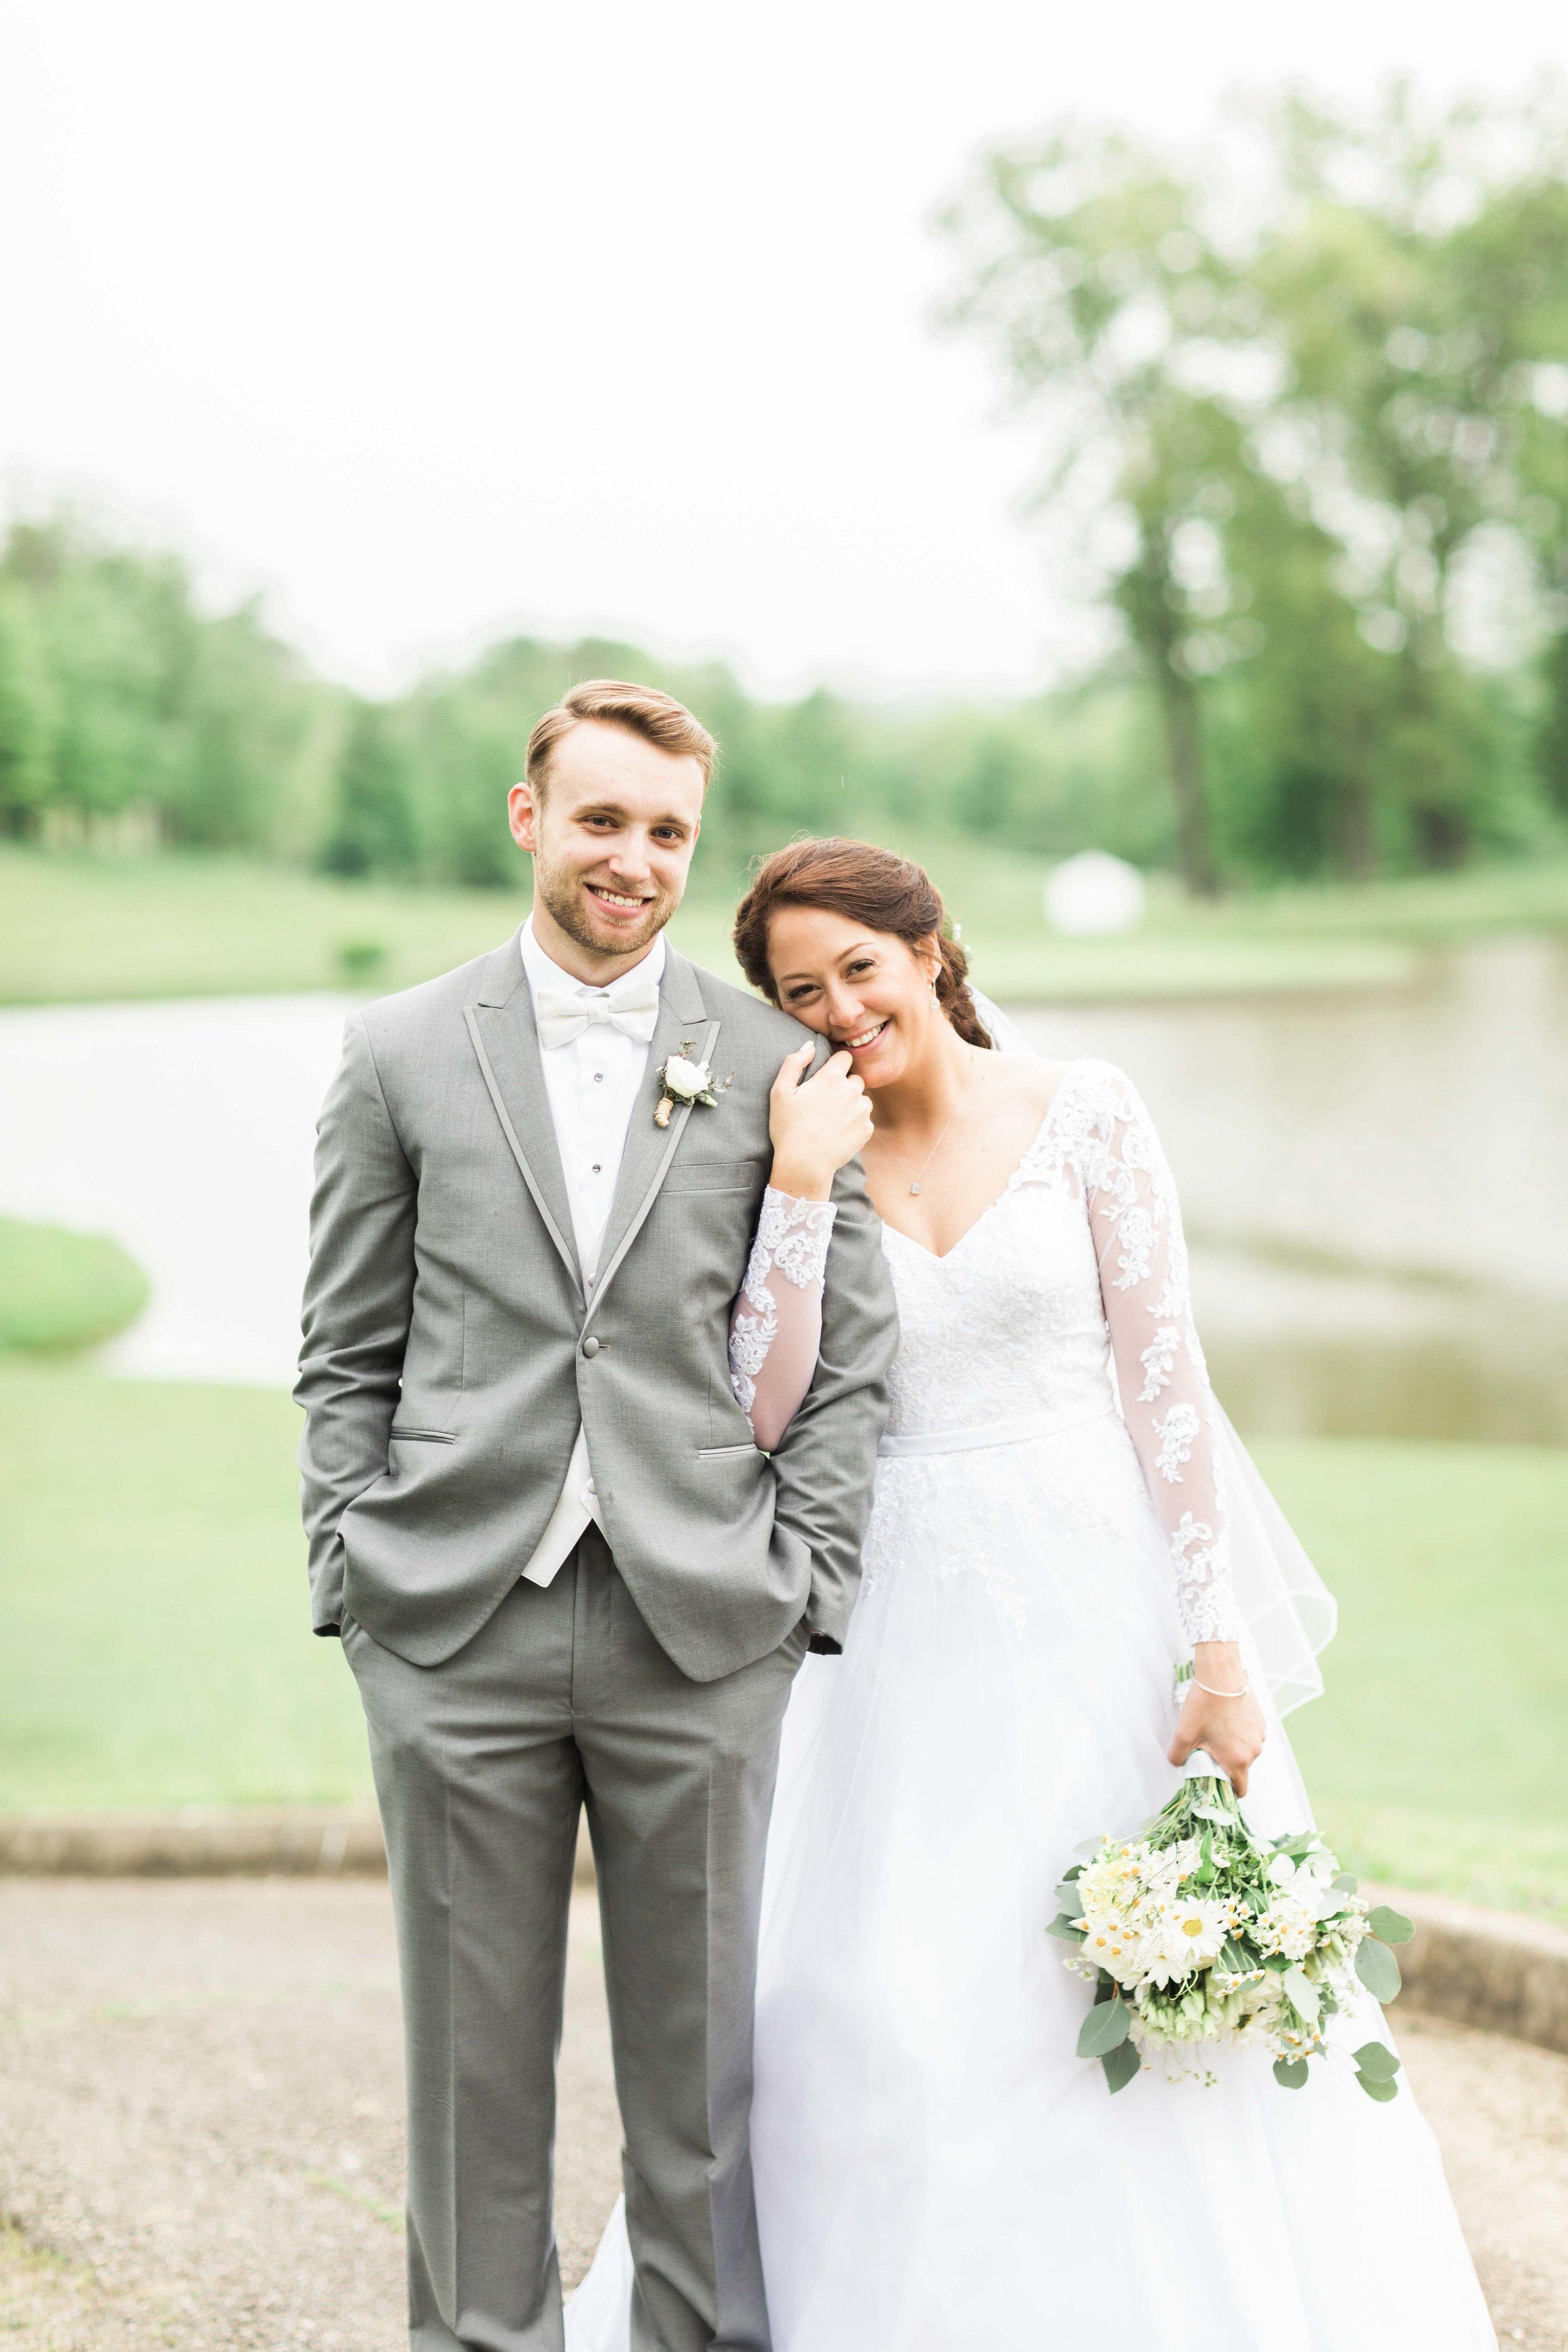 cincinnati wedding photographers lauren day photography-2.jpg